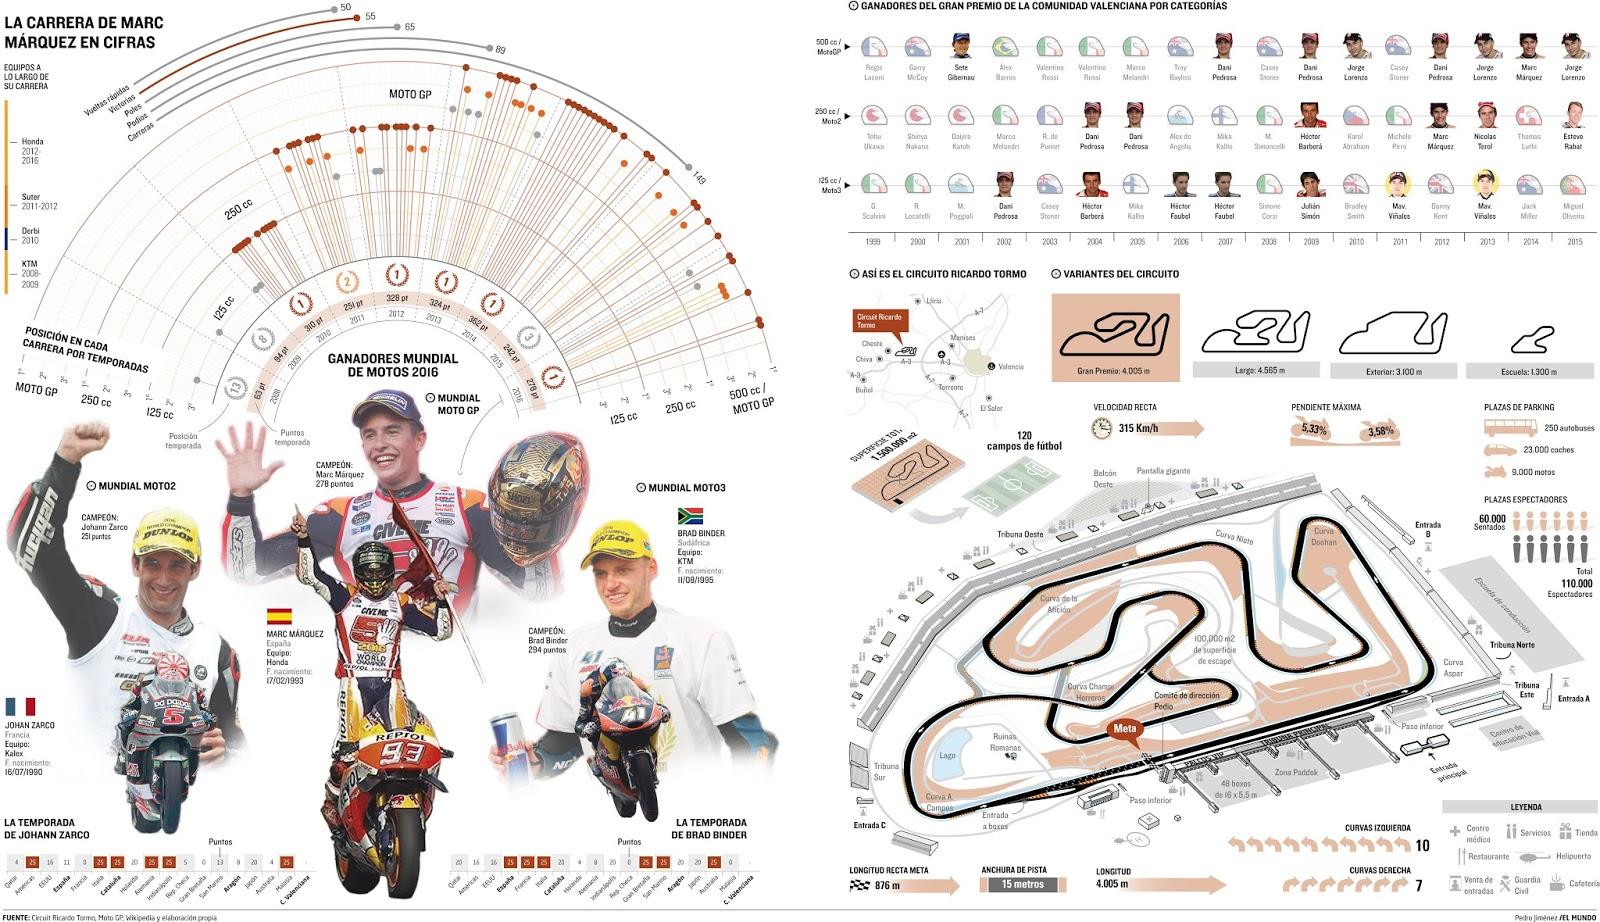 Circuito Cheste : Infografia periodistica y diseño gráfico cheste Última prueba